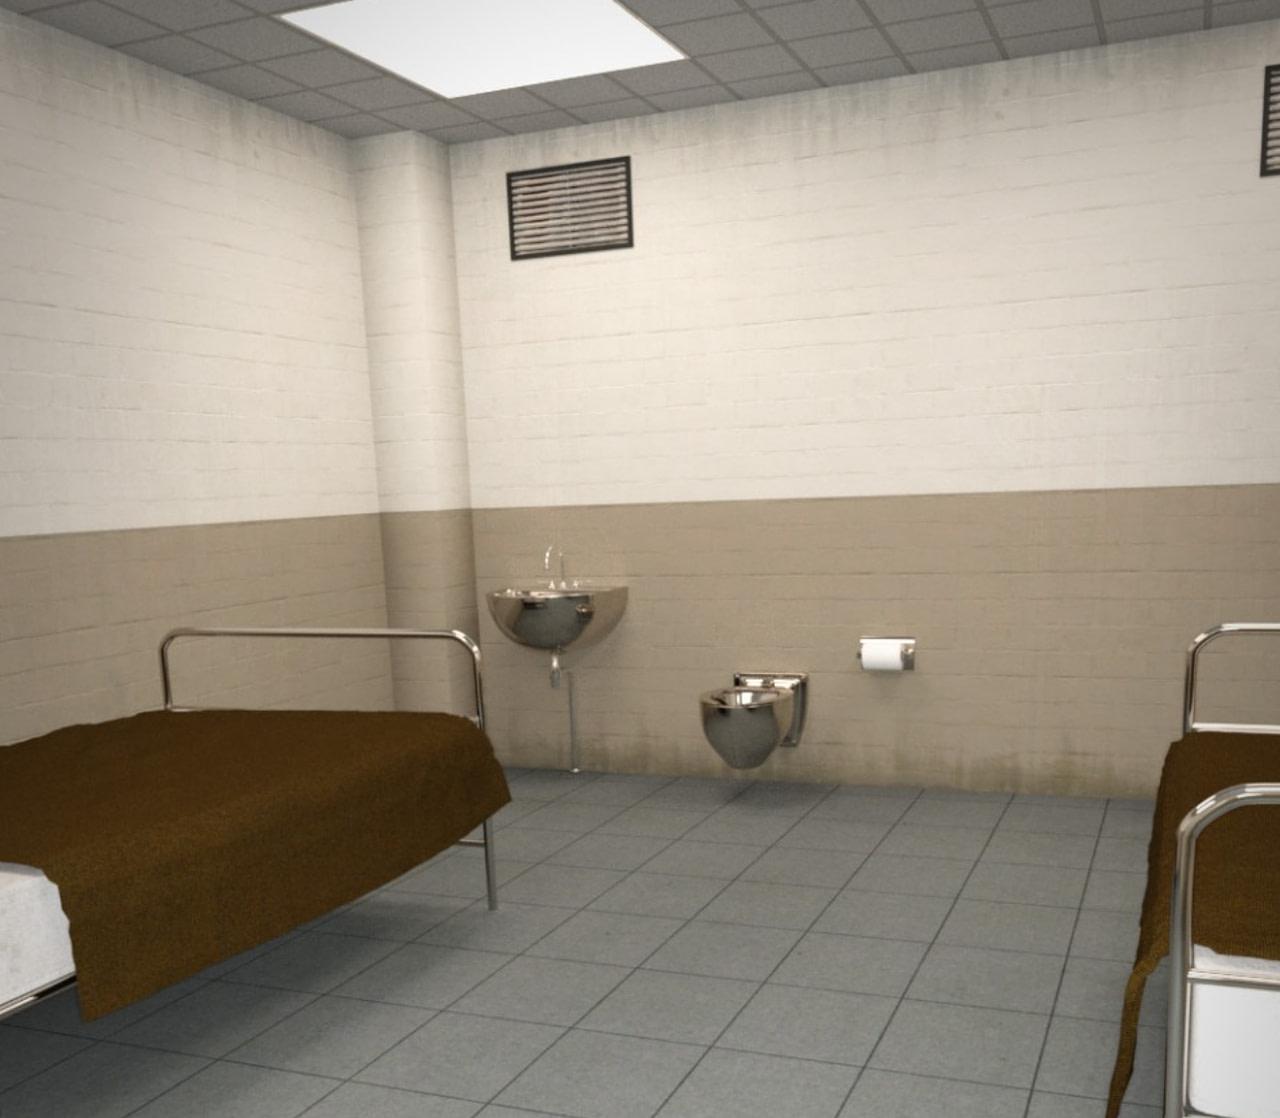 daz confinement cell